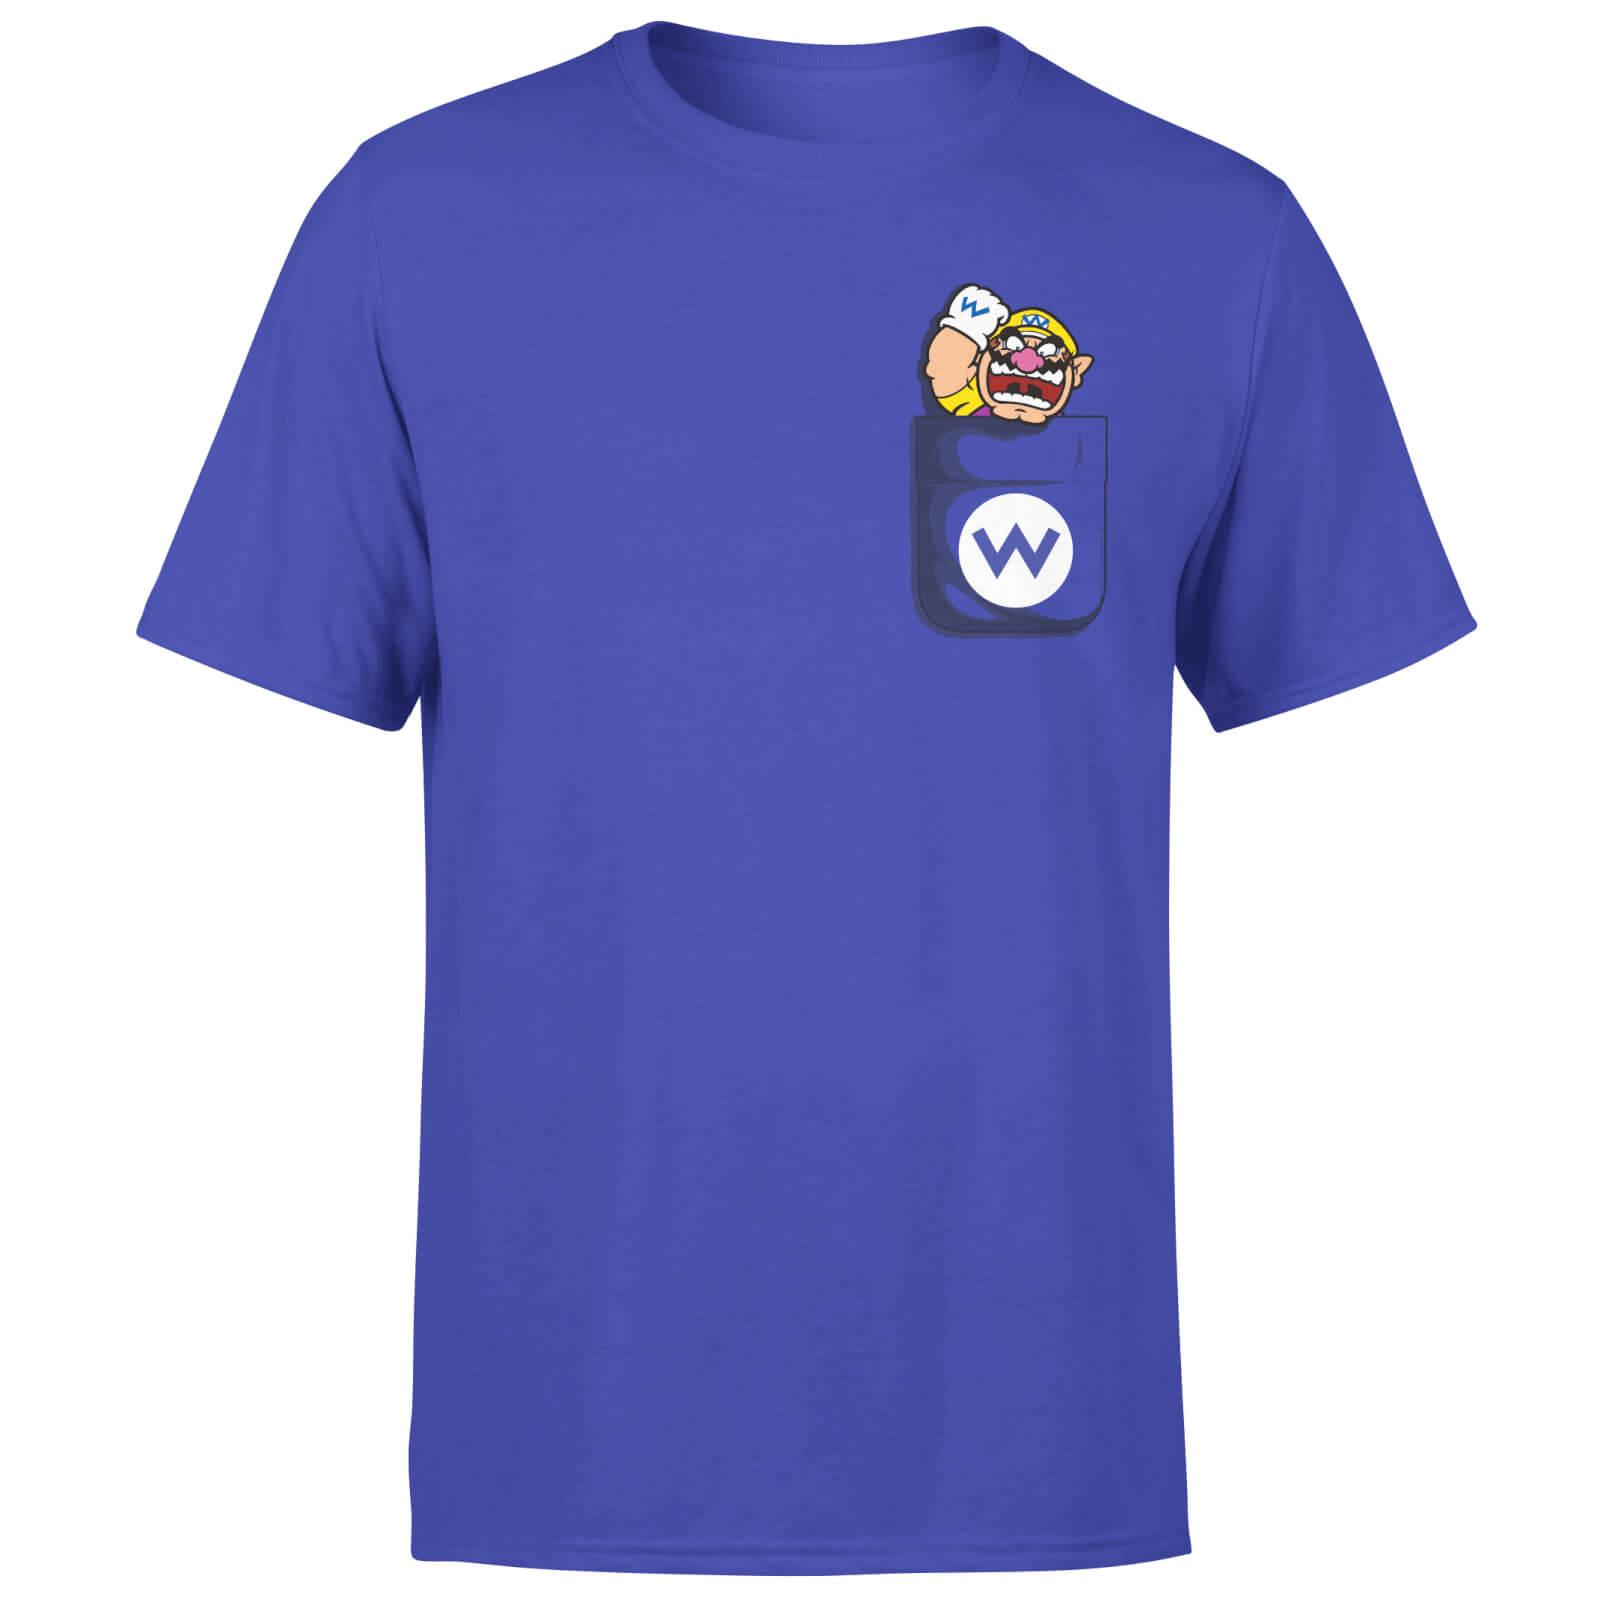 Nintendo Super Mario Wario Pocket Herren T-Shirt - Lila - XL - Violet